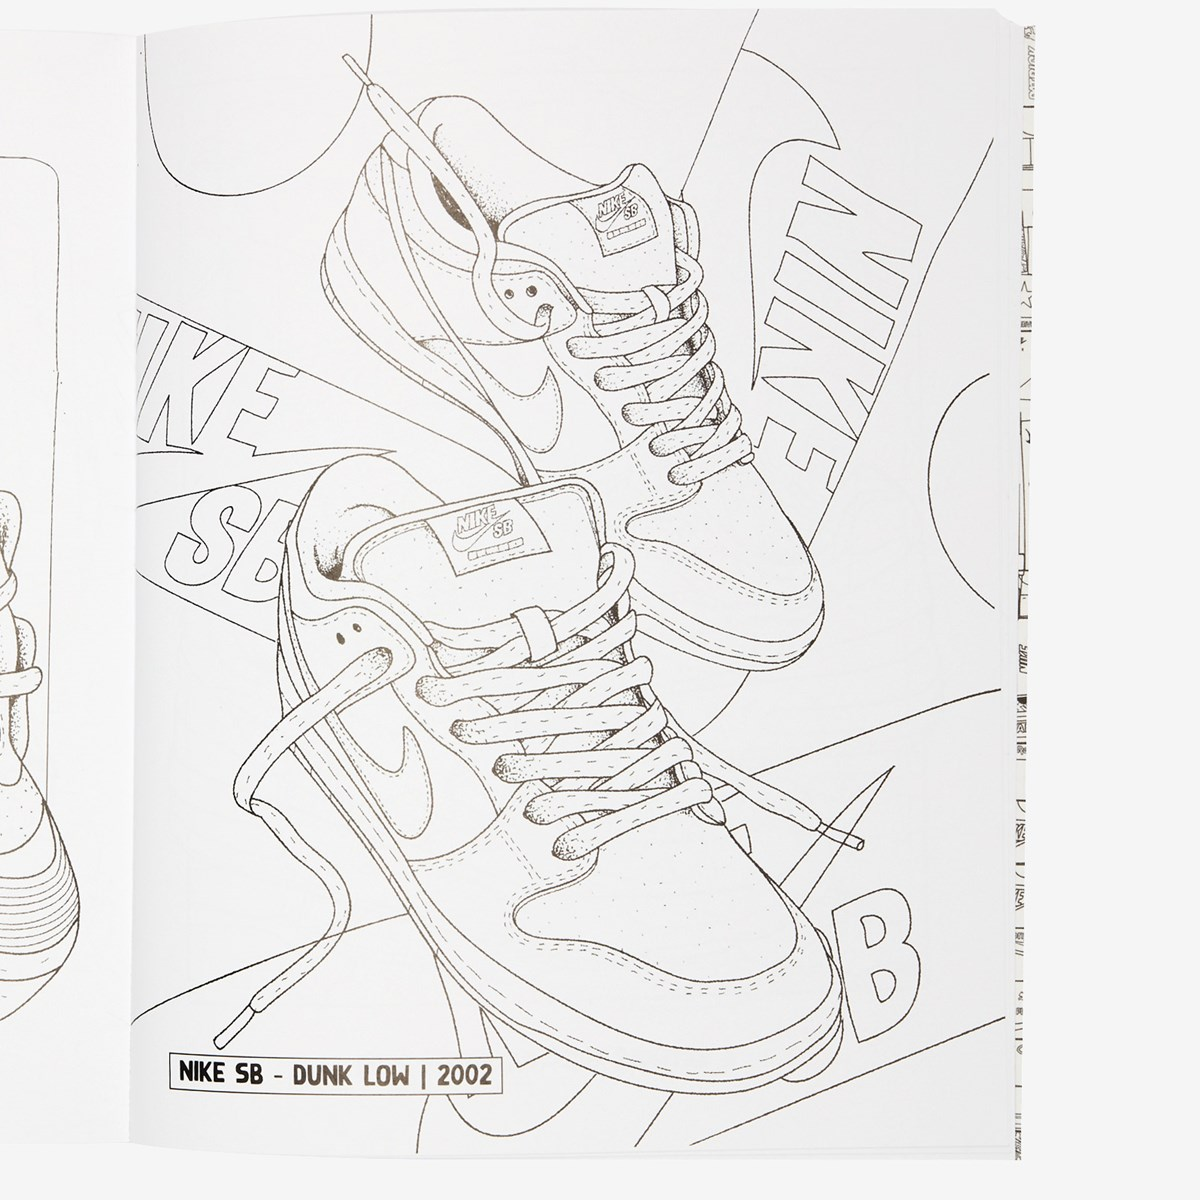 Books Sneaker Coloring Book 9789188369437 Sneakersnstuff Sneakers Streetwear Online Since 1999